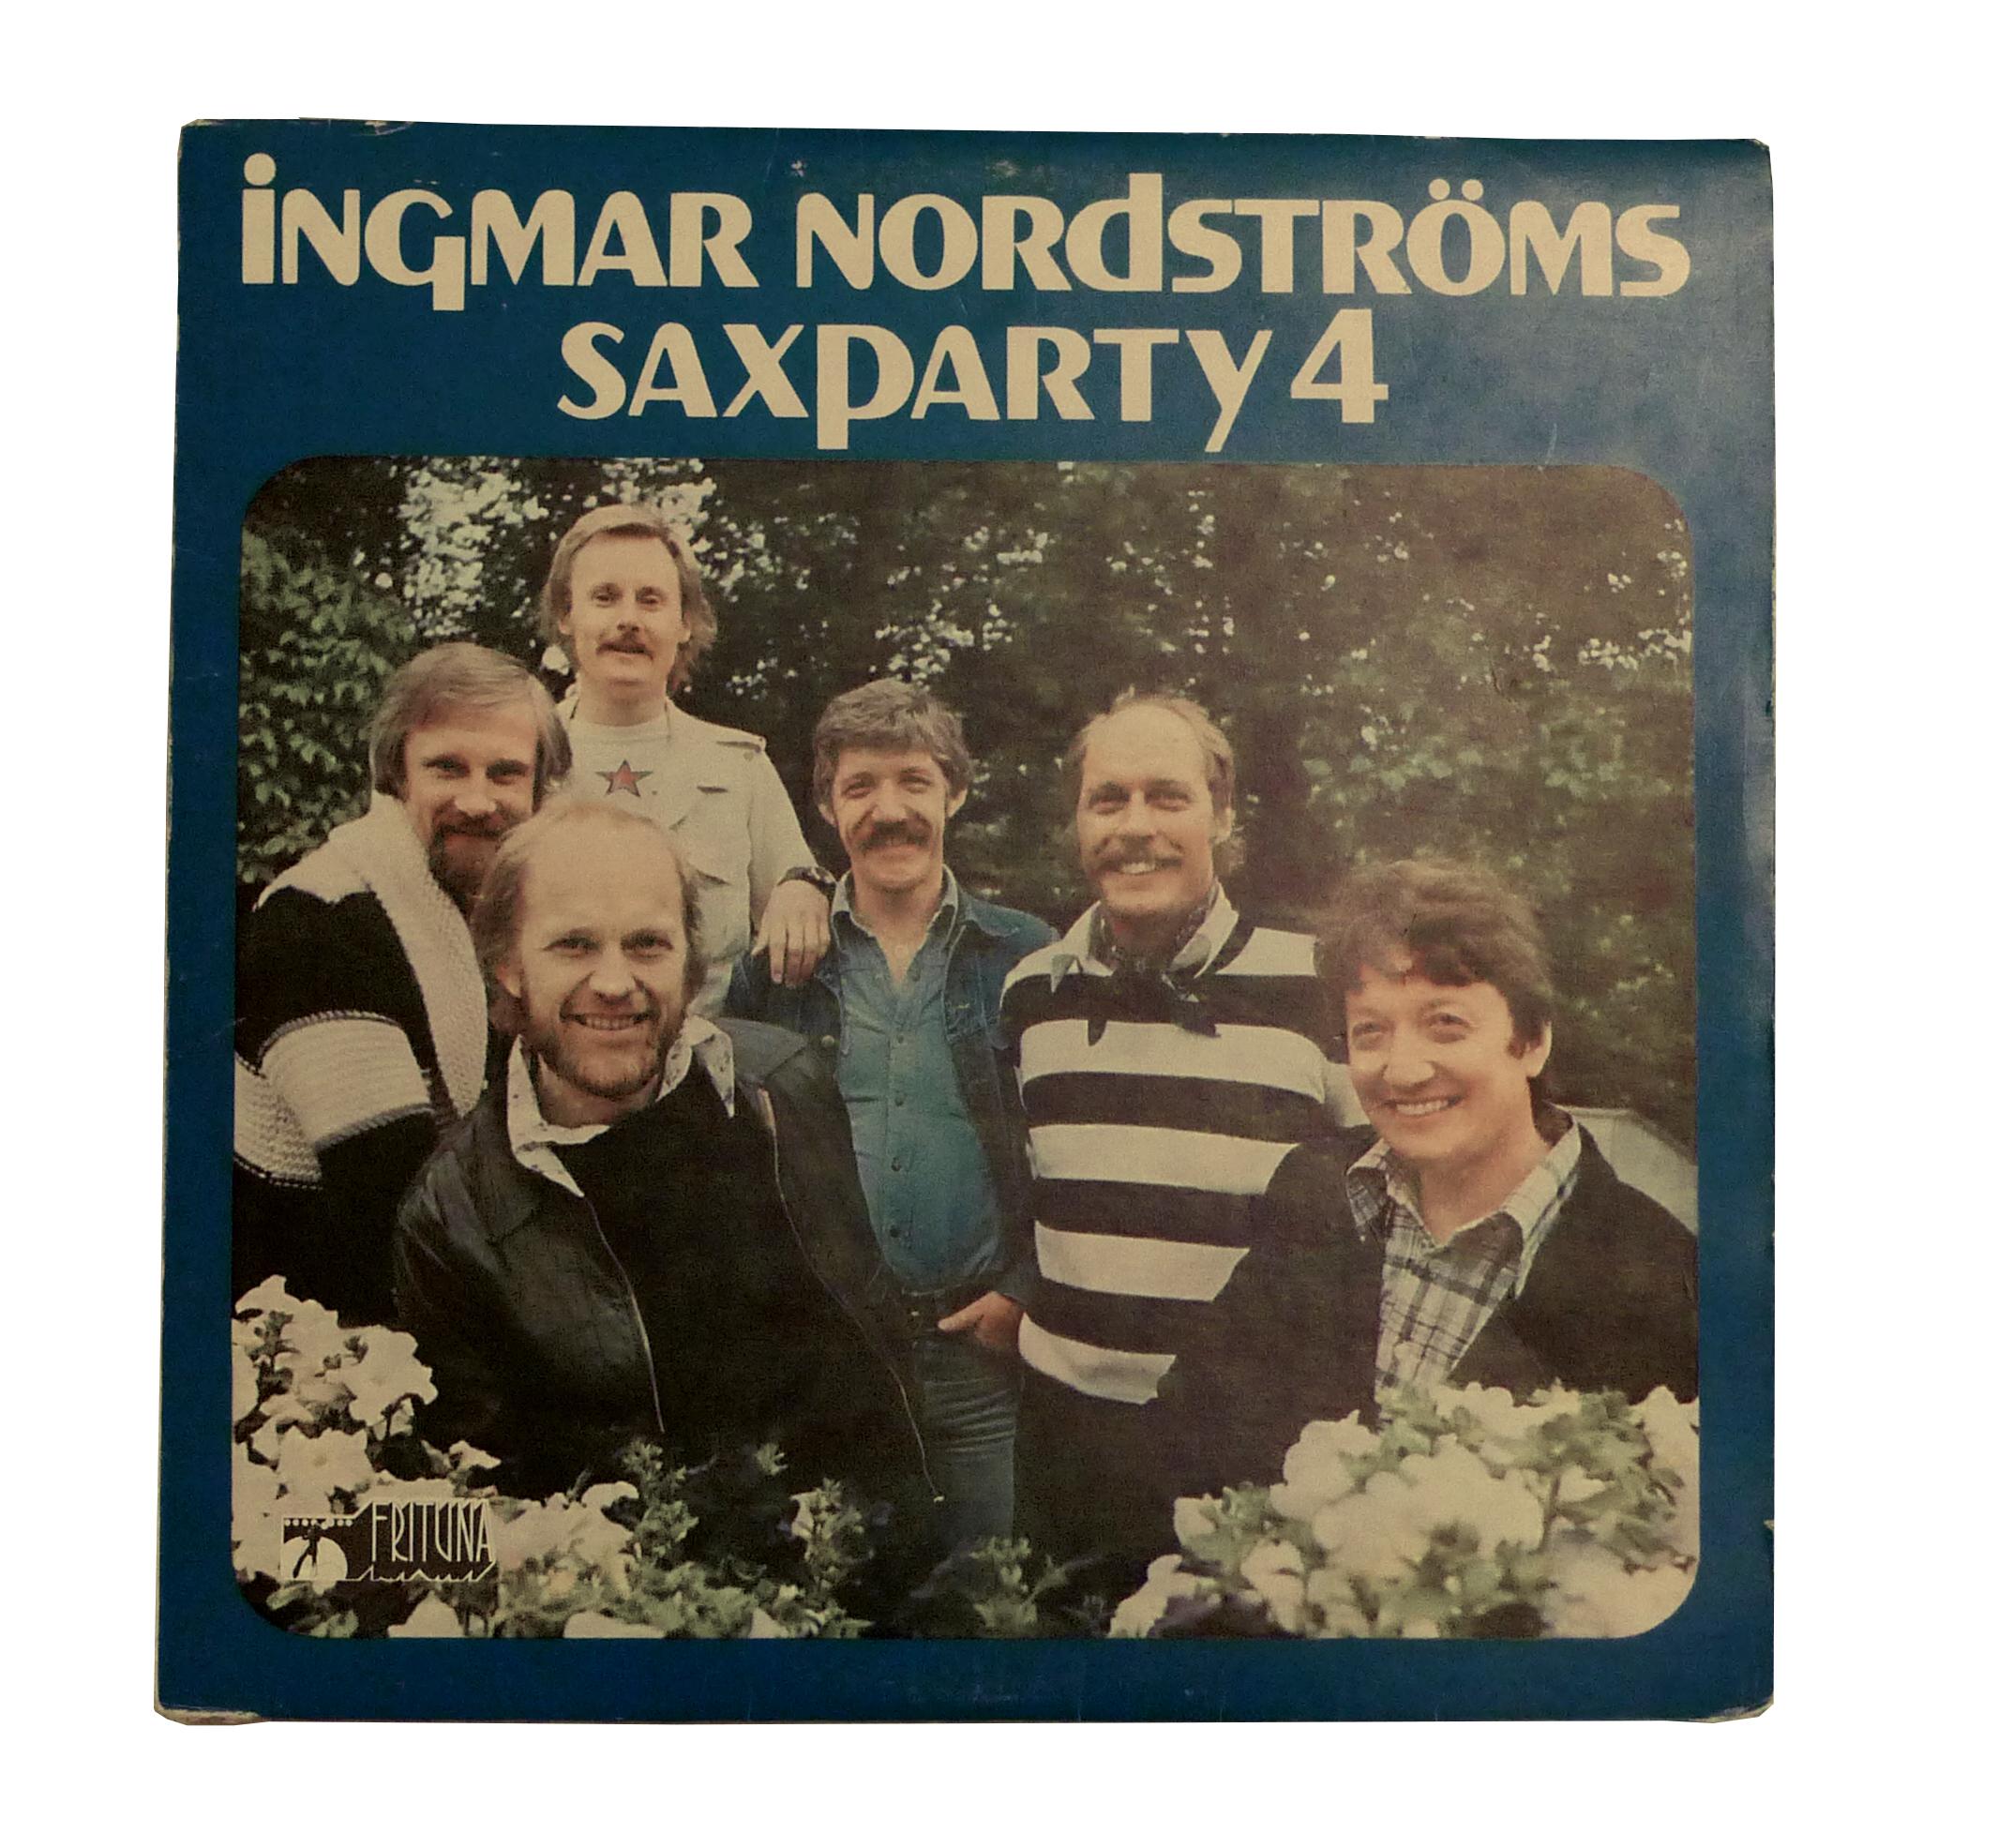 dj50s ep013 sleeve ingmar nordstroms